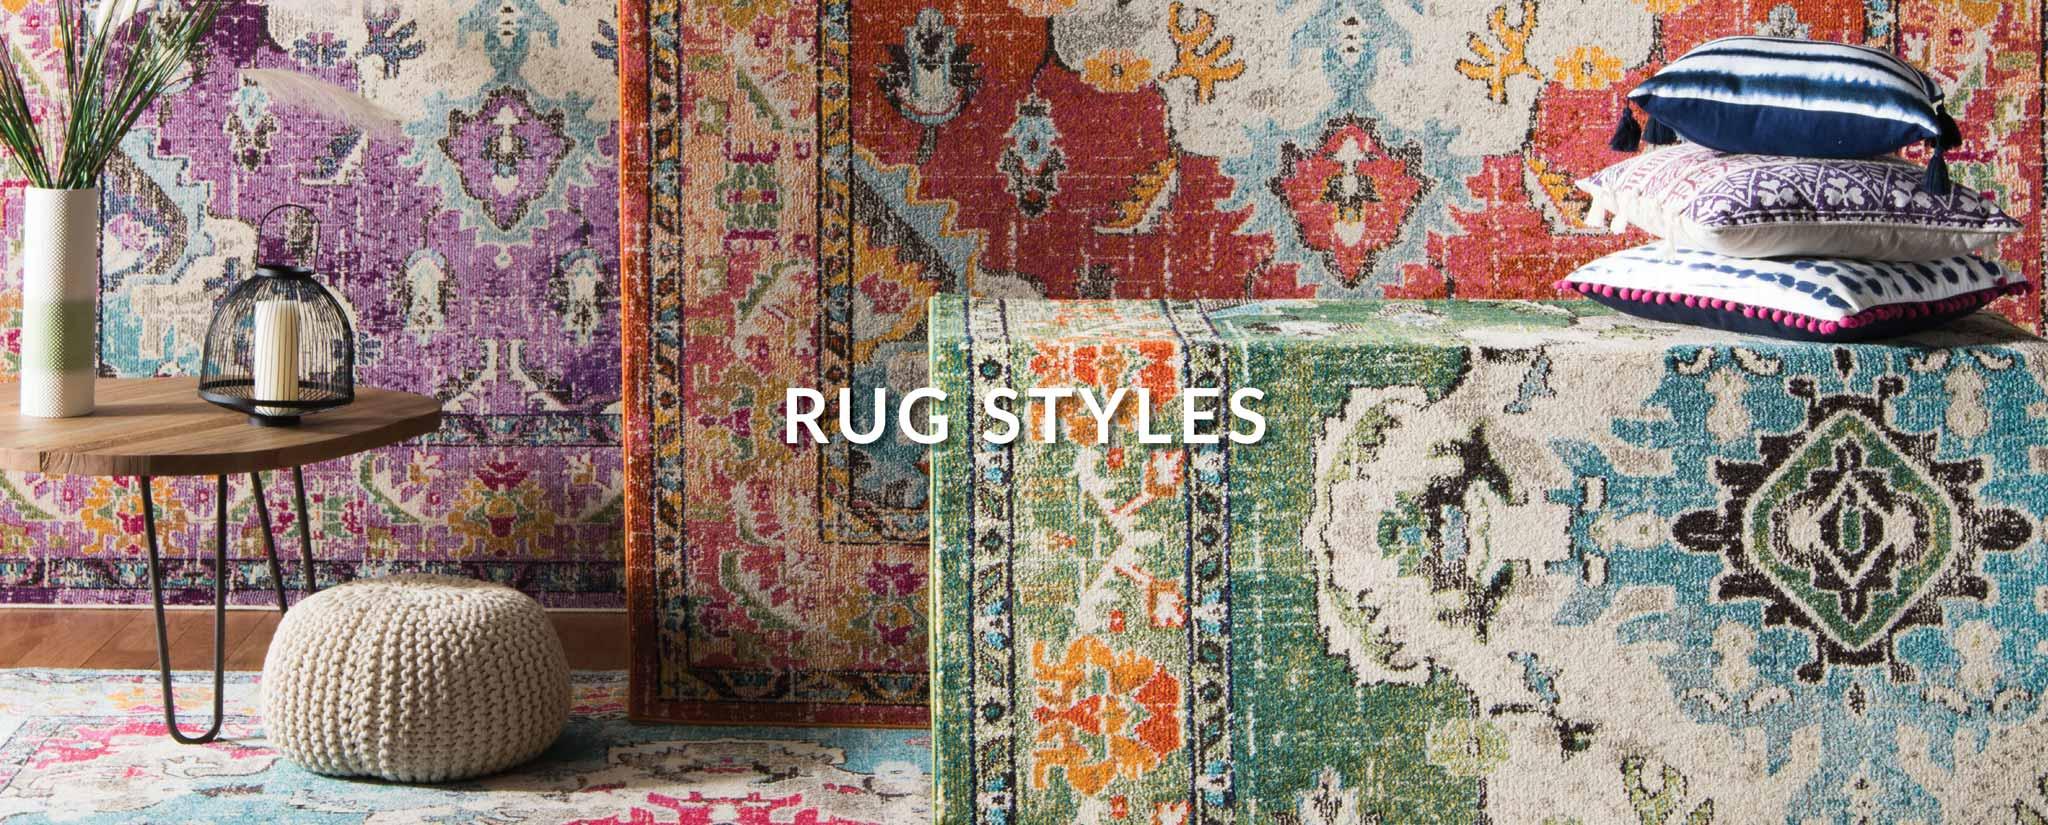 Safavieh Rug Styles